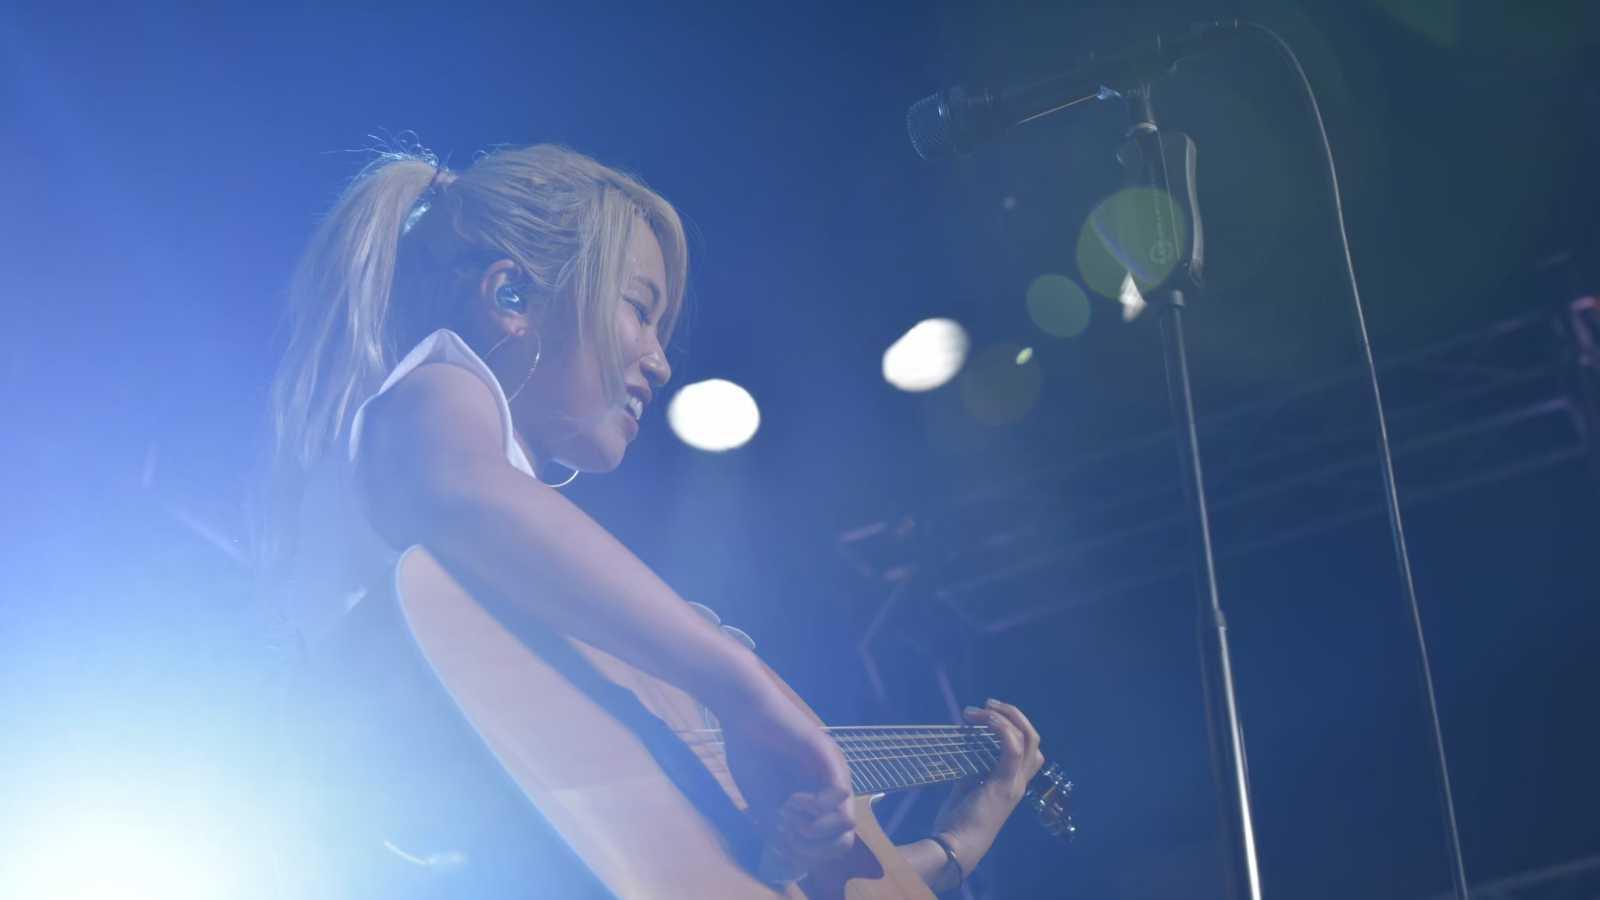 Вокалистка Aldious возобновляет соло-карьеру © R!N. All rights reserved.